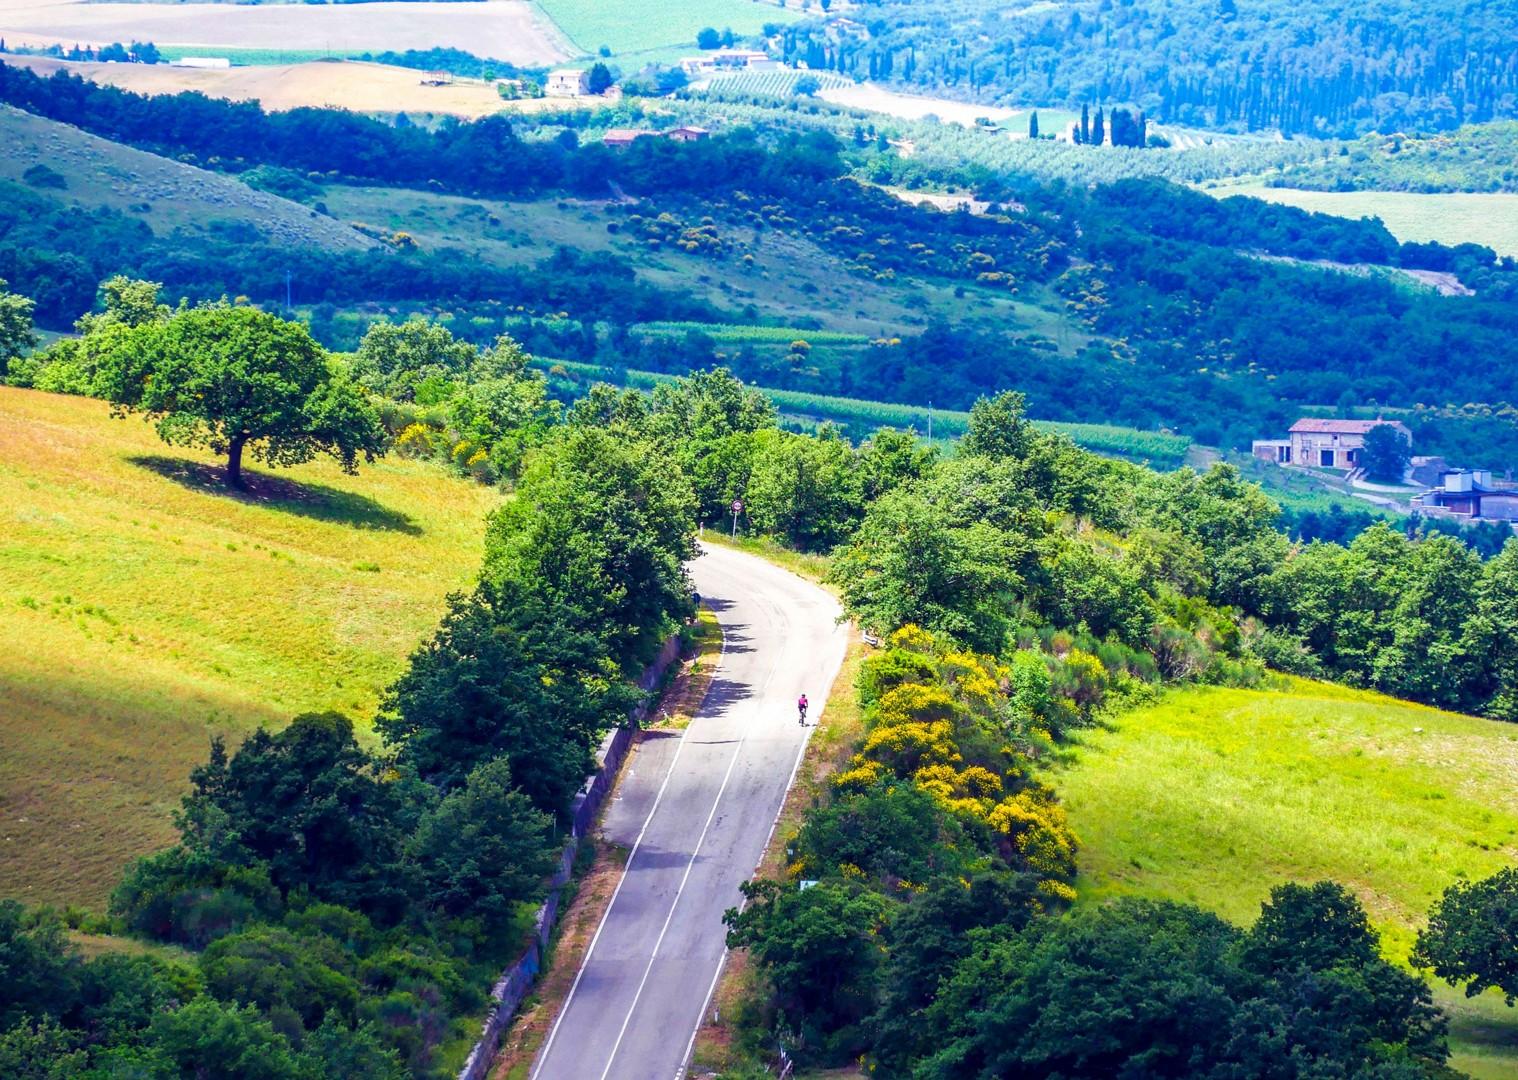 julian-alps-and-istria-slovenia-and-croatia-cycling-guided-road-holiday.jpg - Slovenia & Croatia - Julian Alps & Istria - Guided Road Cycling Holiday - Road Cycling